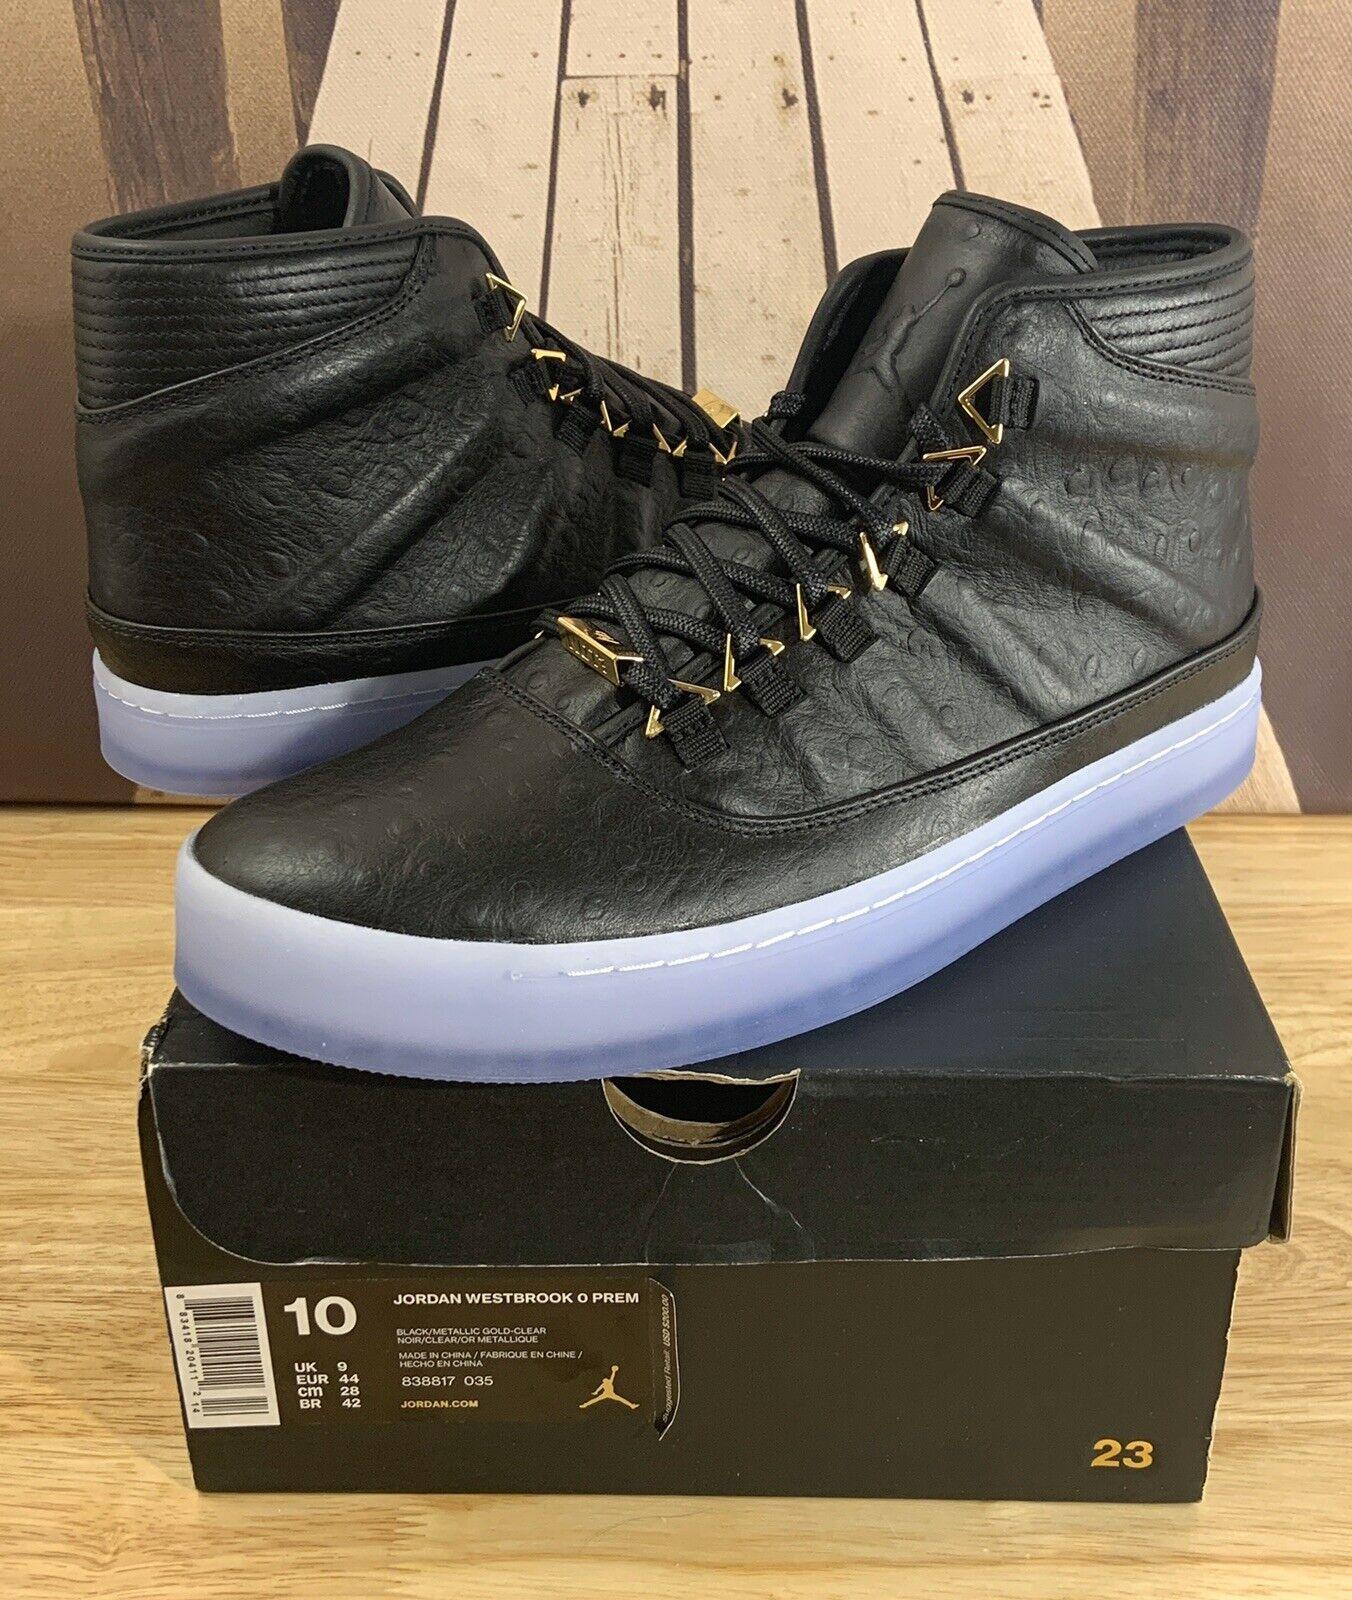 Nike Jordan Westbrook 0 Low 850772 10